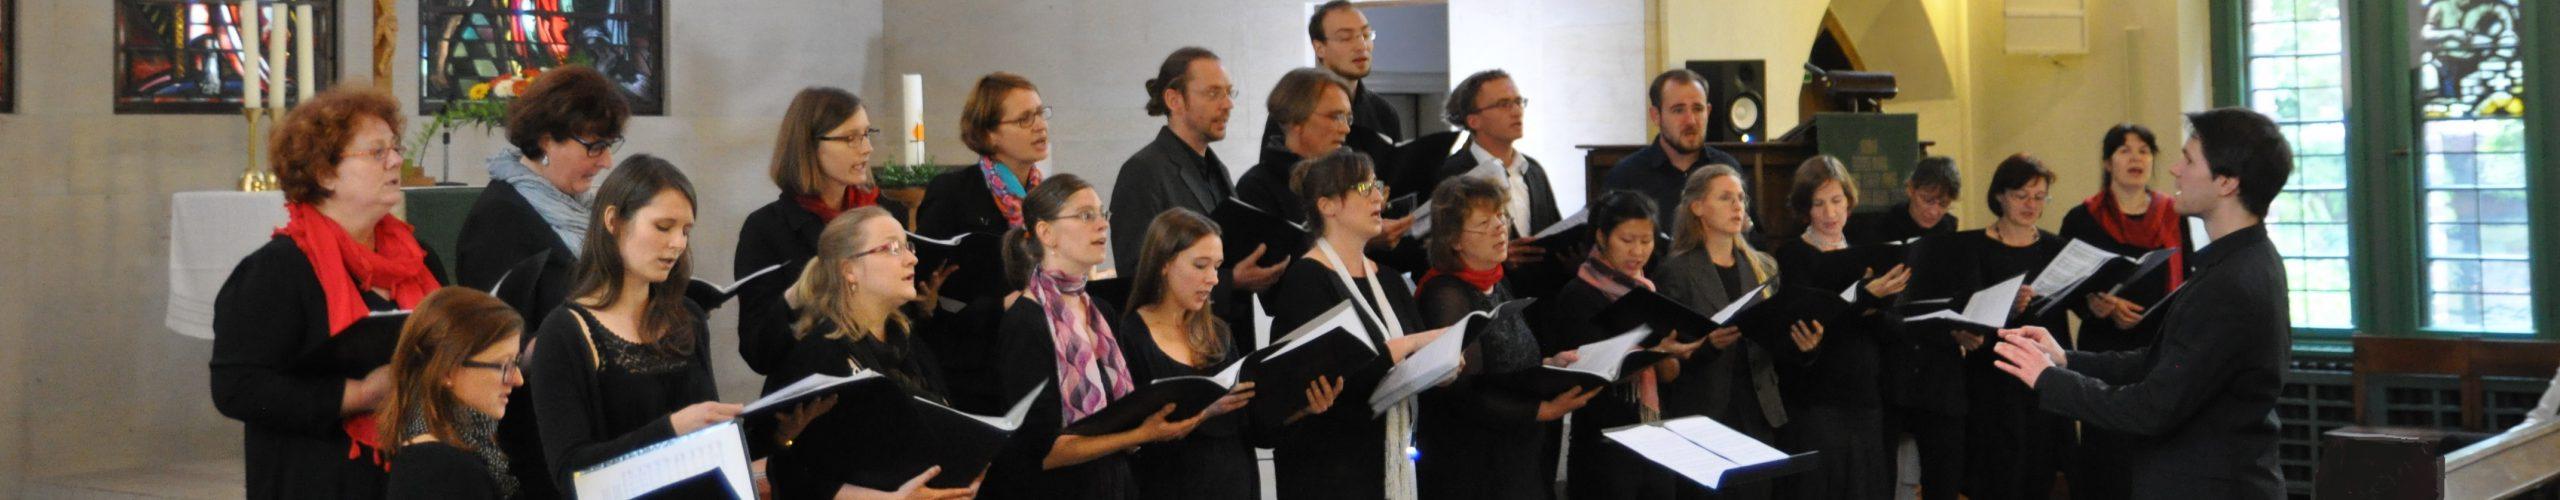 Singt-Pauli-Chor